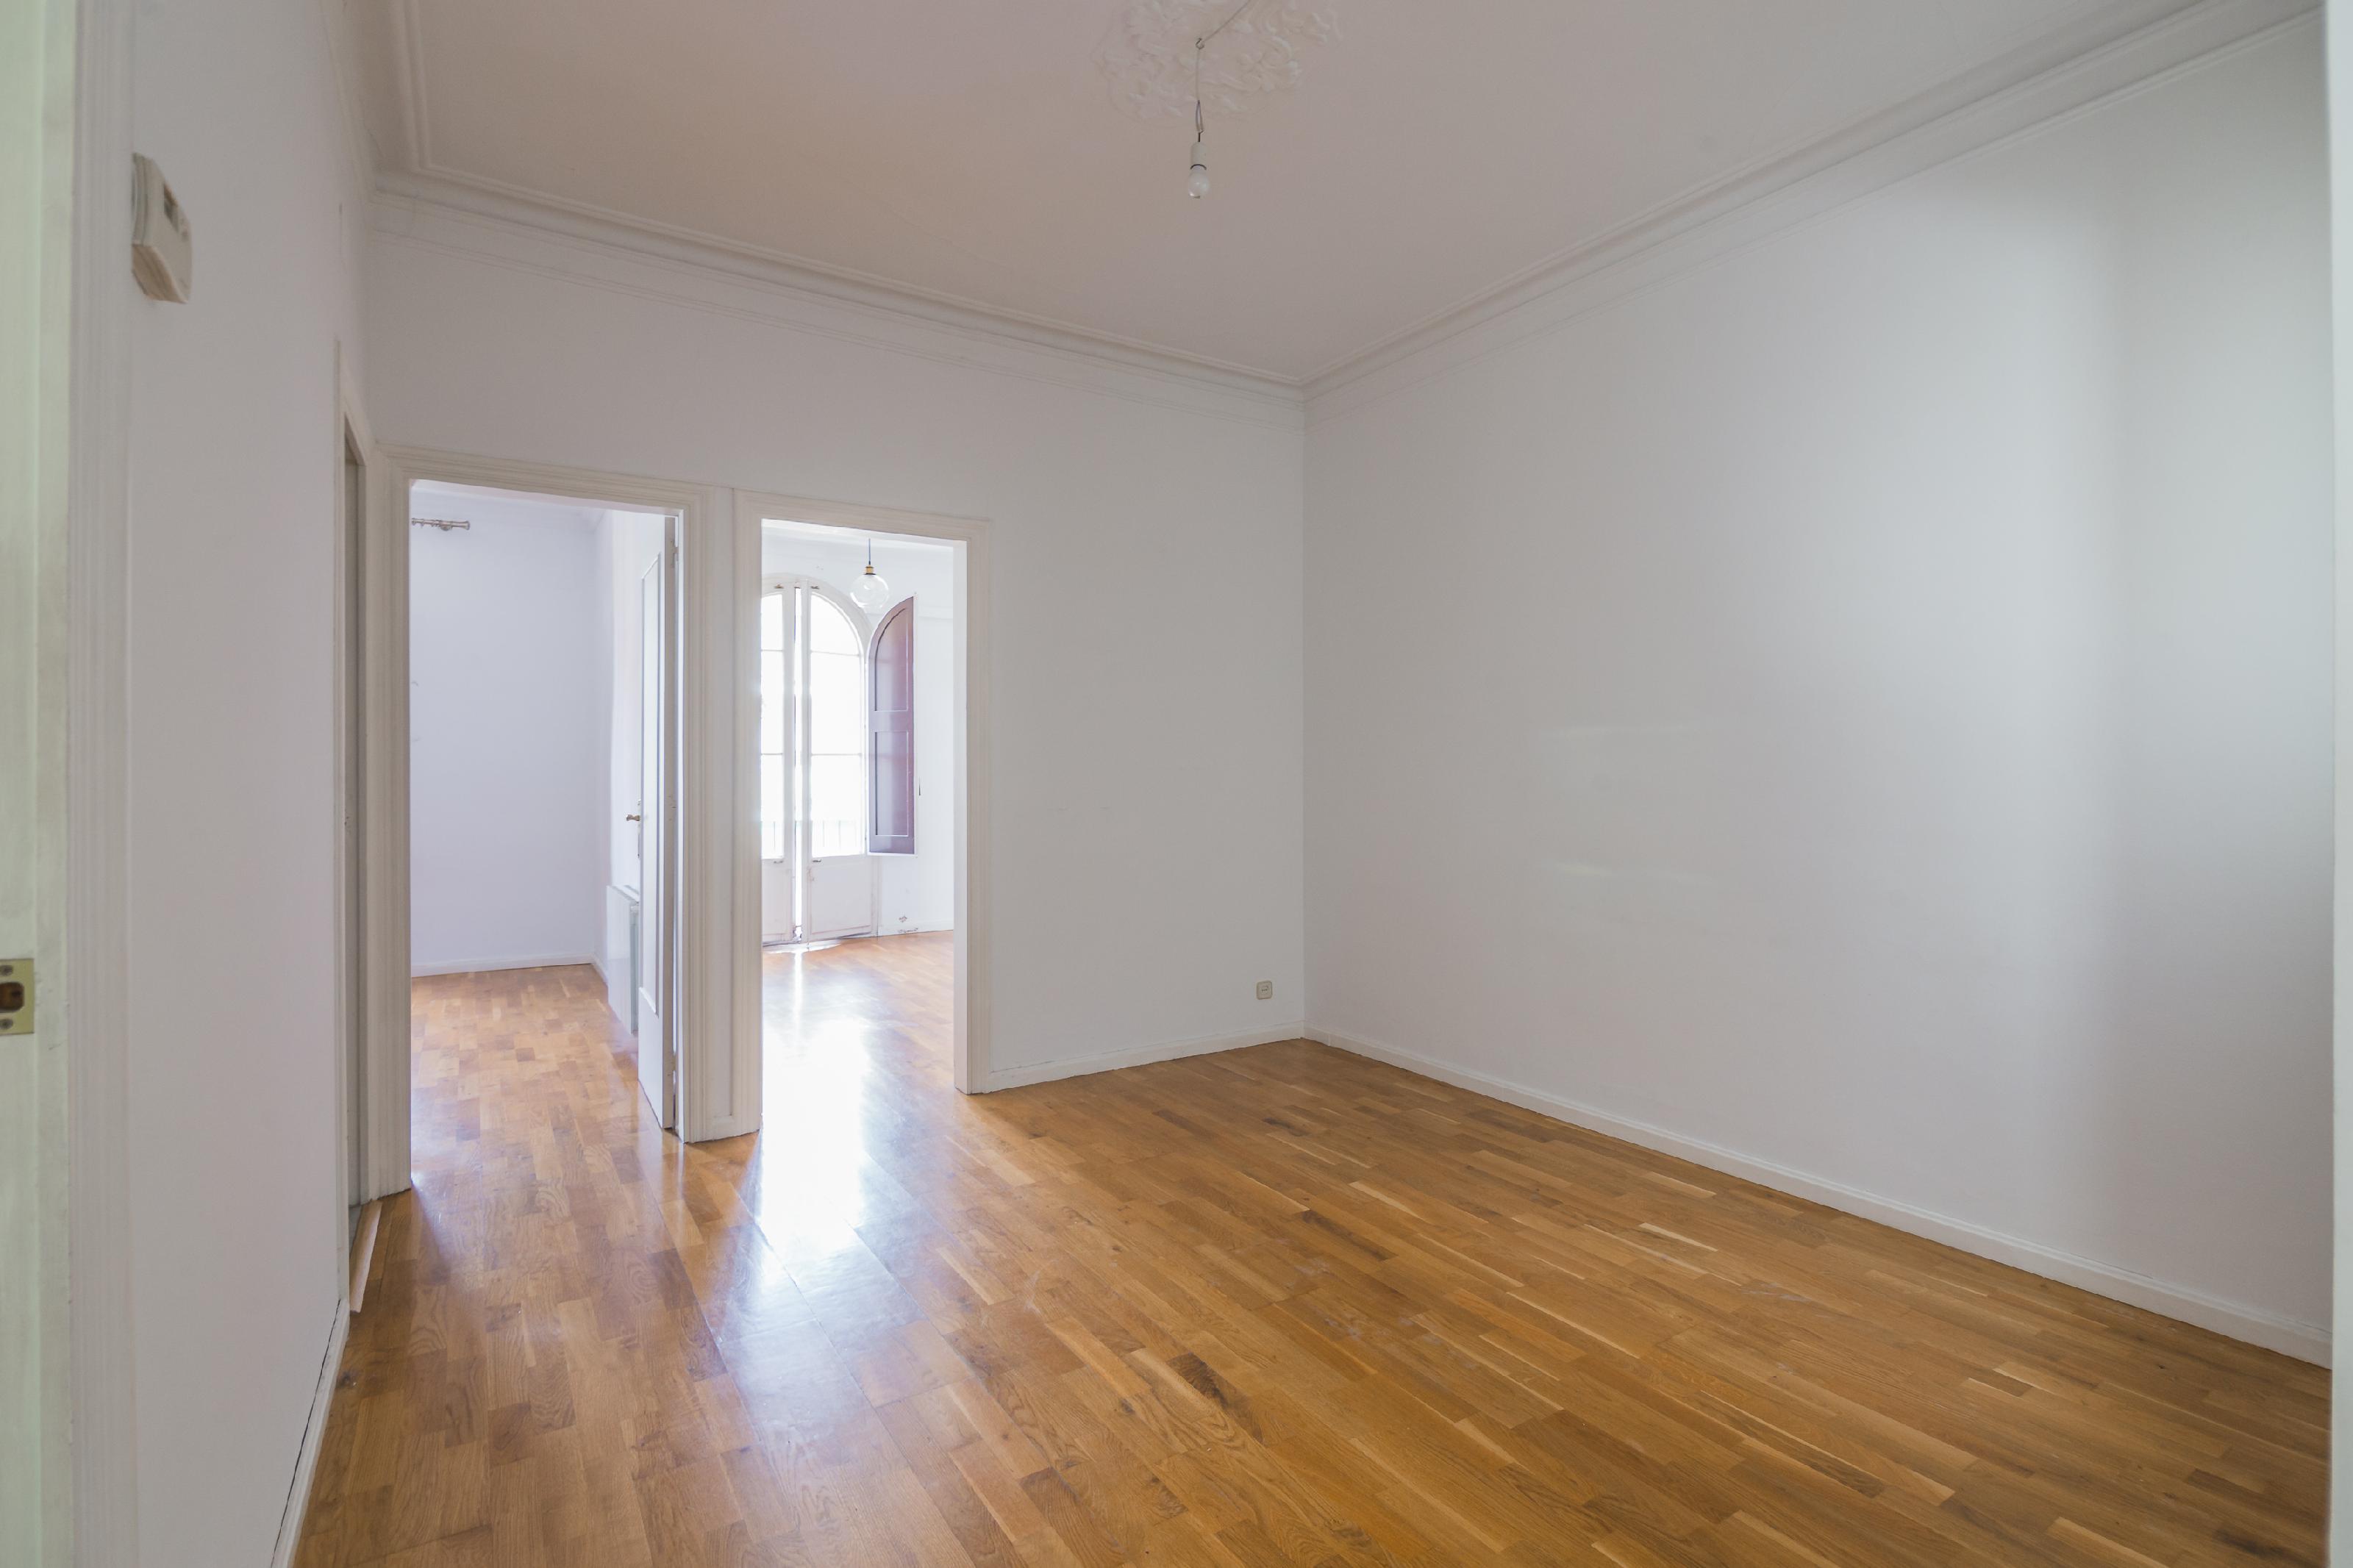 246907 Flat for sale in Eixample, Nova Esquerra Eixample 10